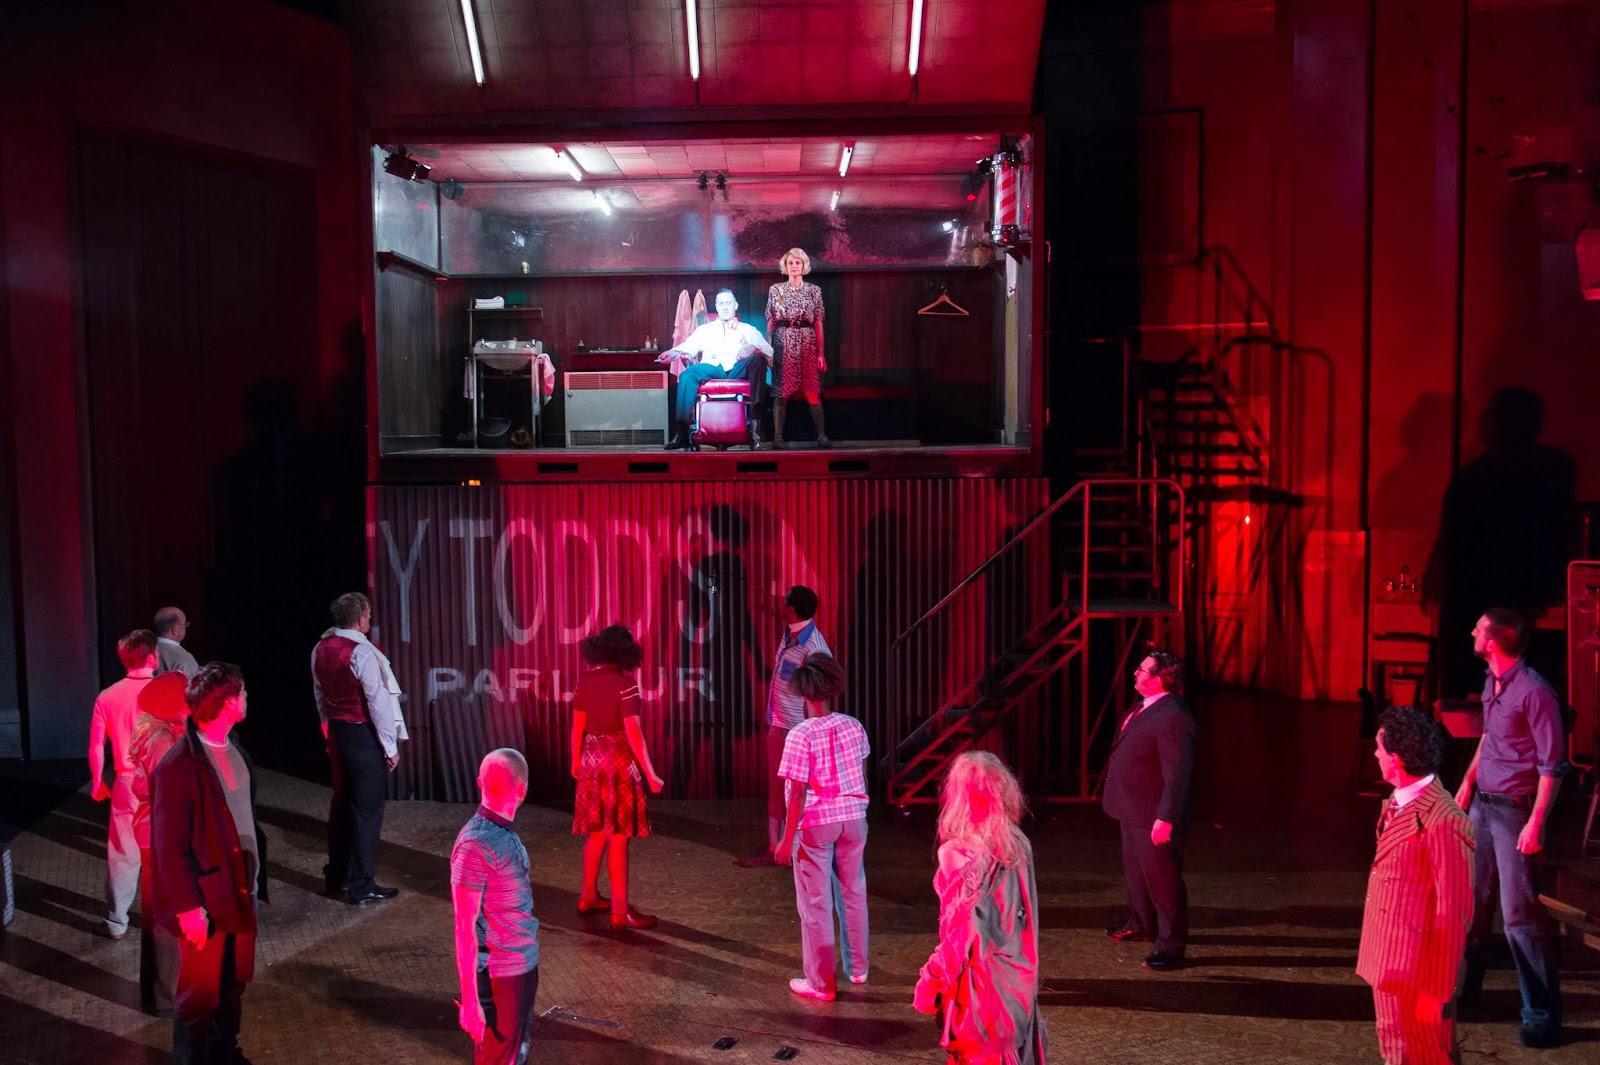 Sweeney Todd - David Birrell, Gillian Bevan & Ensemble  Credit: Manuel Harlan